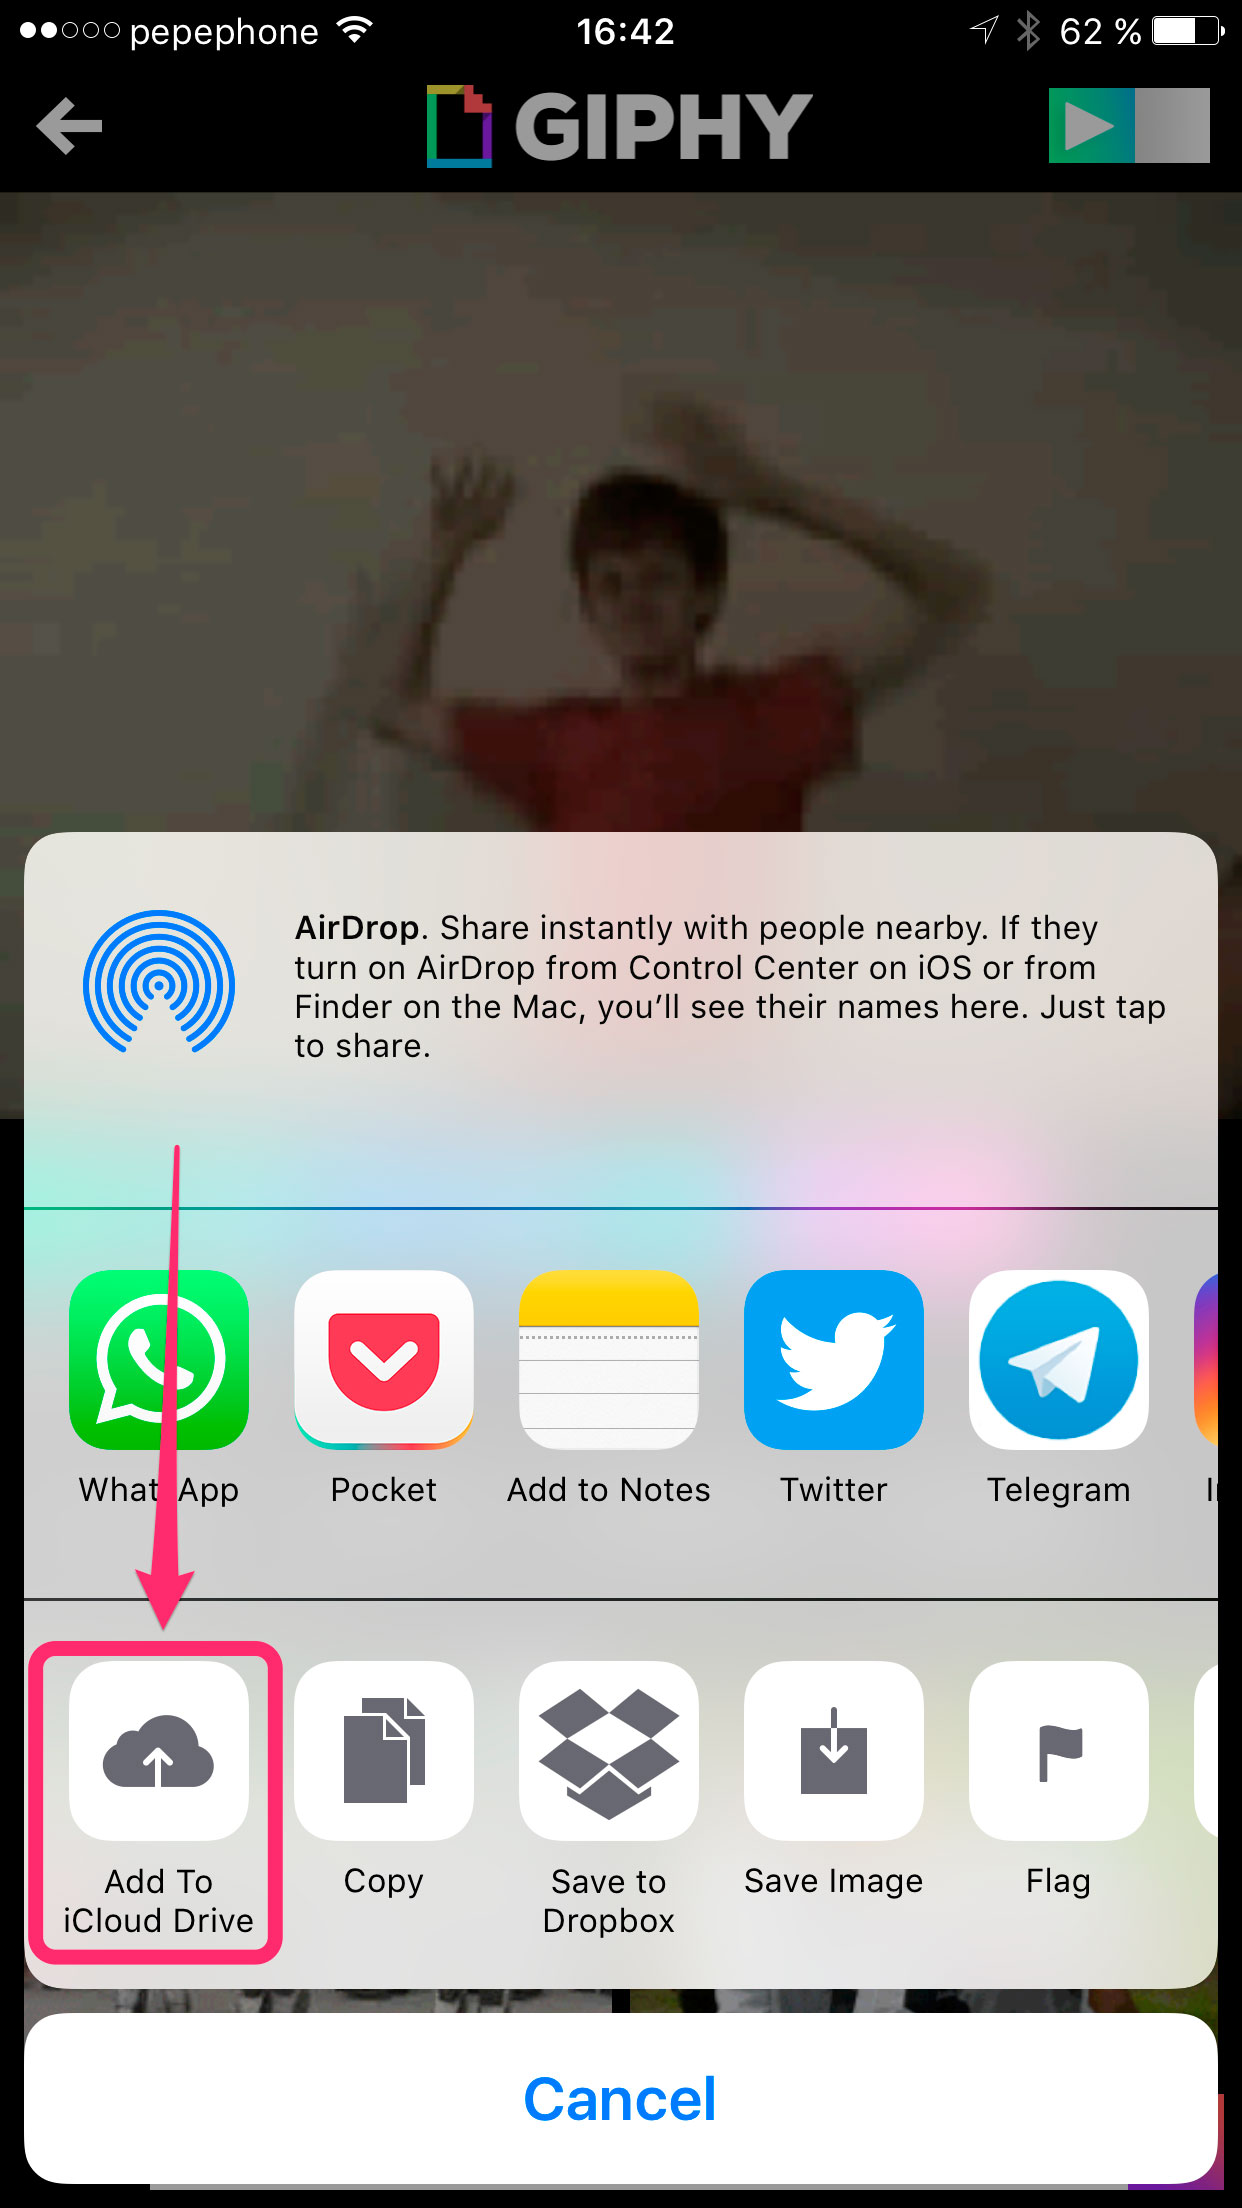 como mandar gif no whatsapp iphone 4